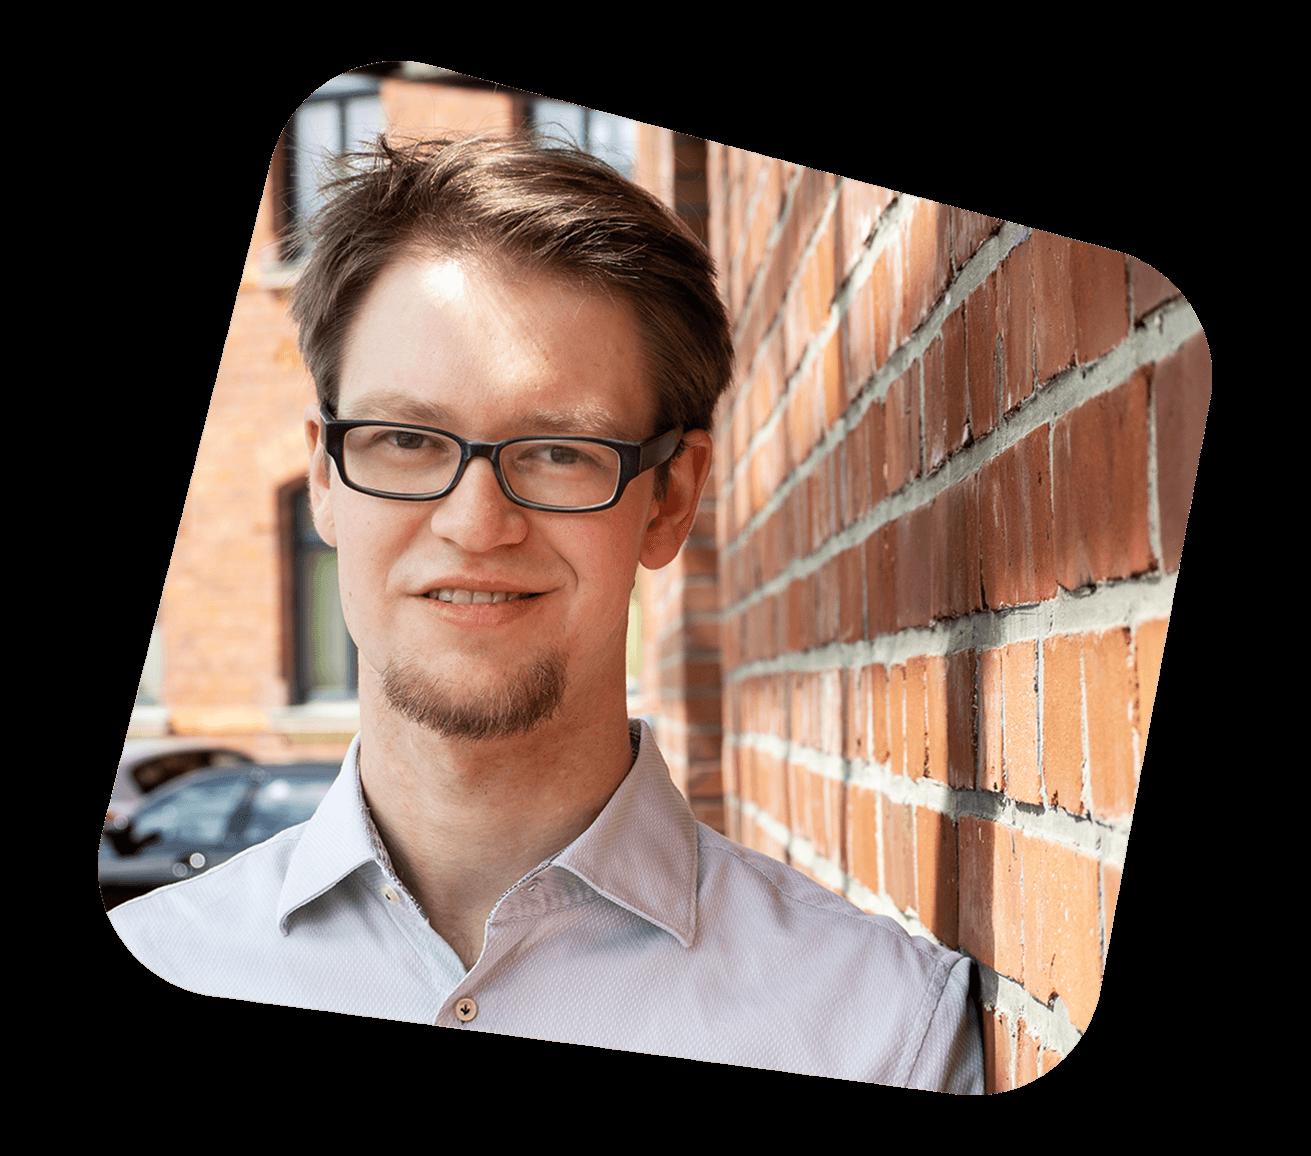 Teammitglied Head of Technology Lennard Bredenkamp